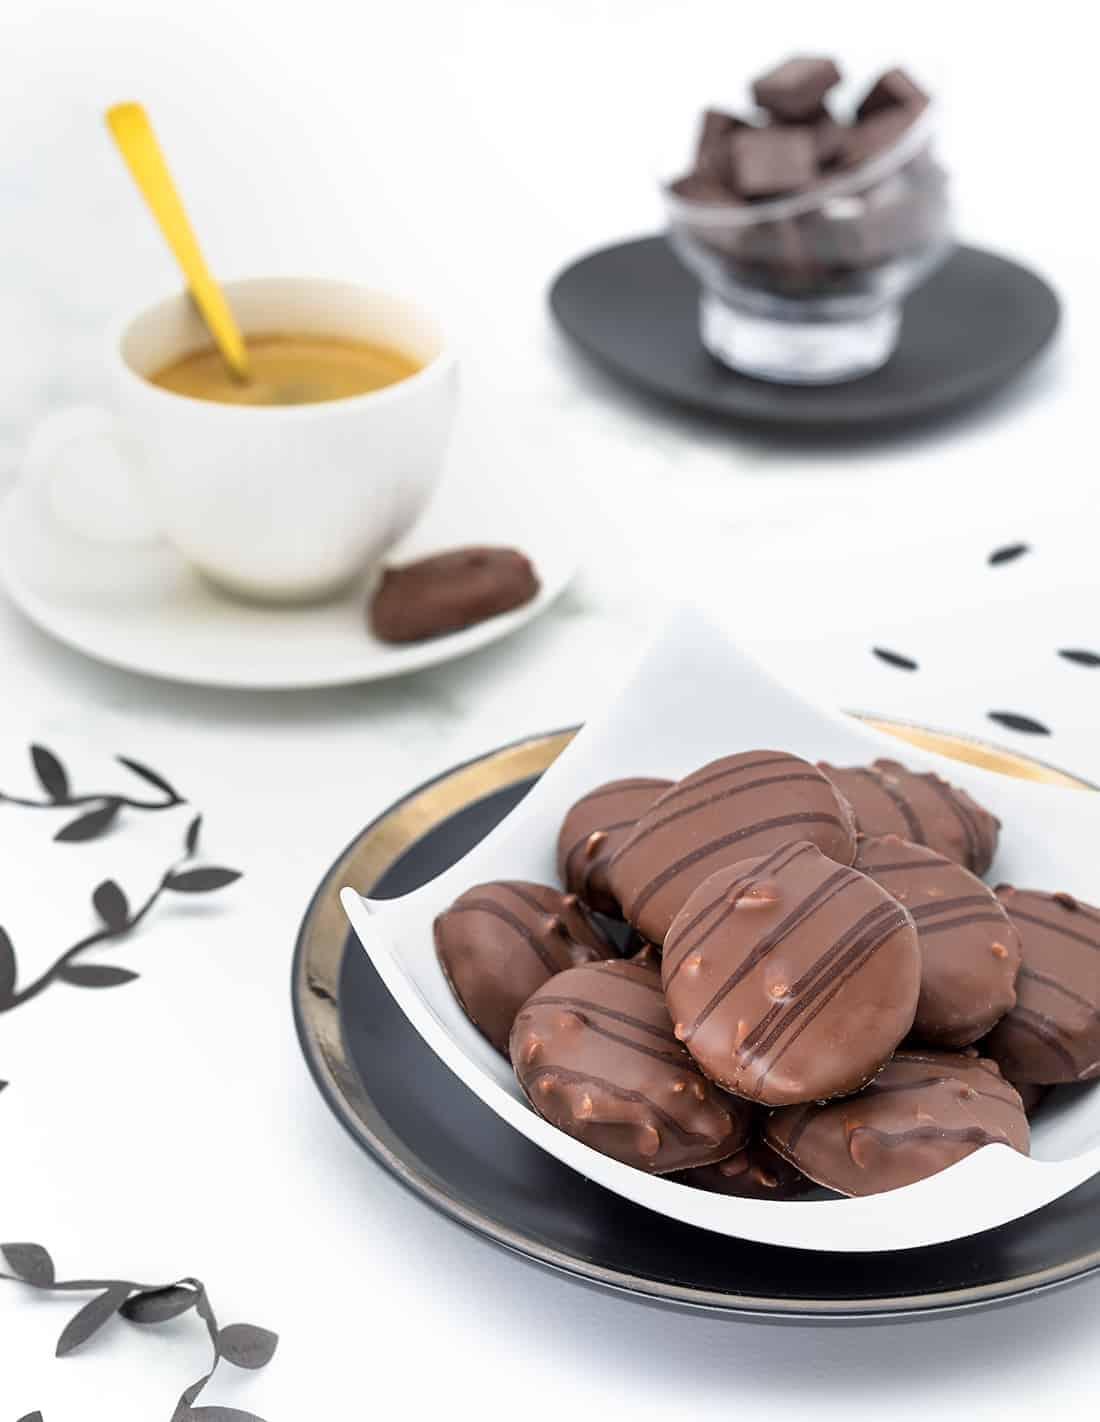 Chocooning - lot de 2 sachets